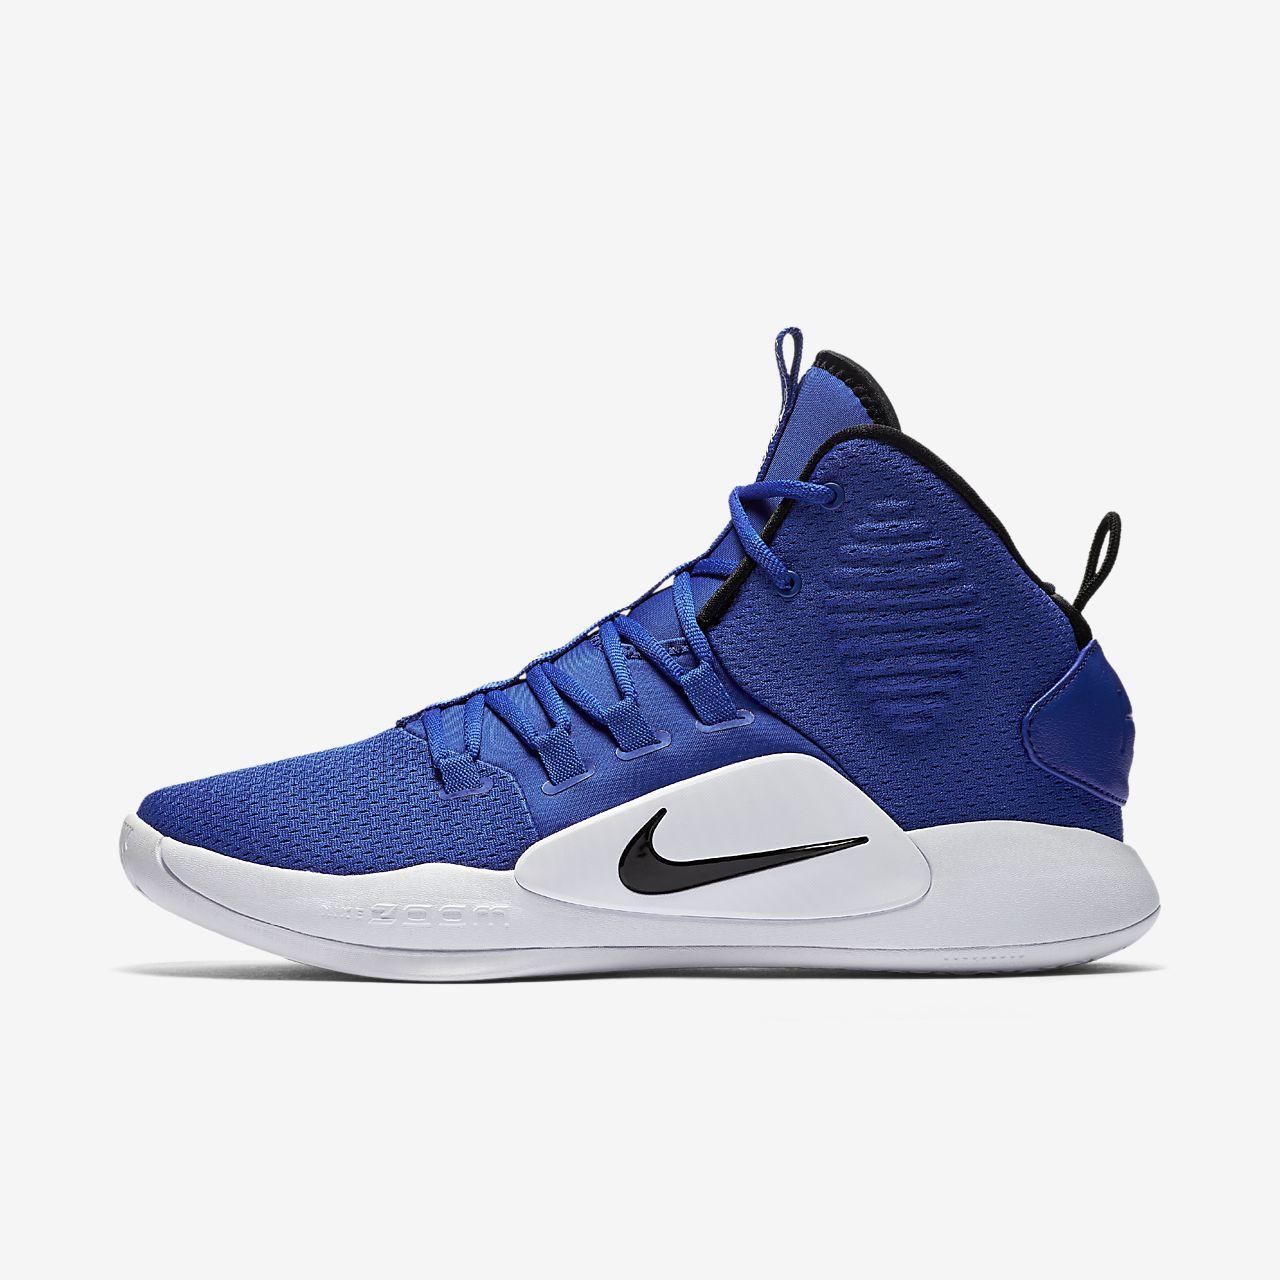 a5b90b8f301d Nike Hyperdunk X TB Basketball Shoe. Nike.com